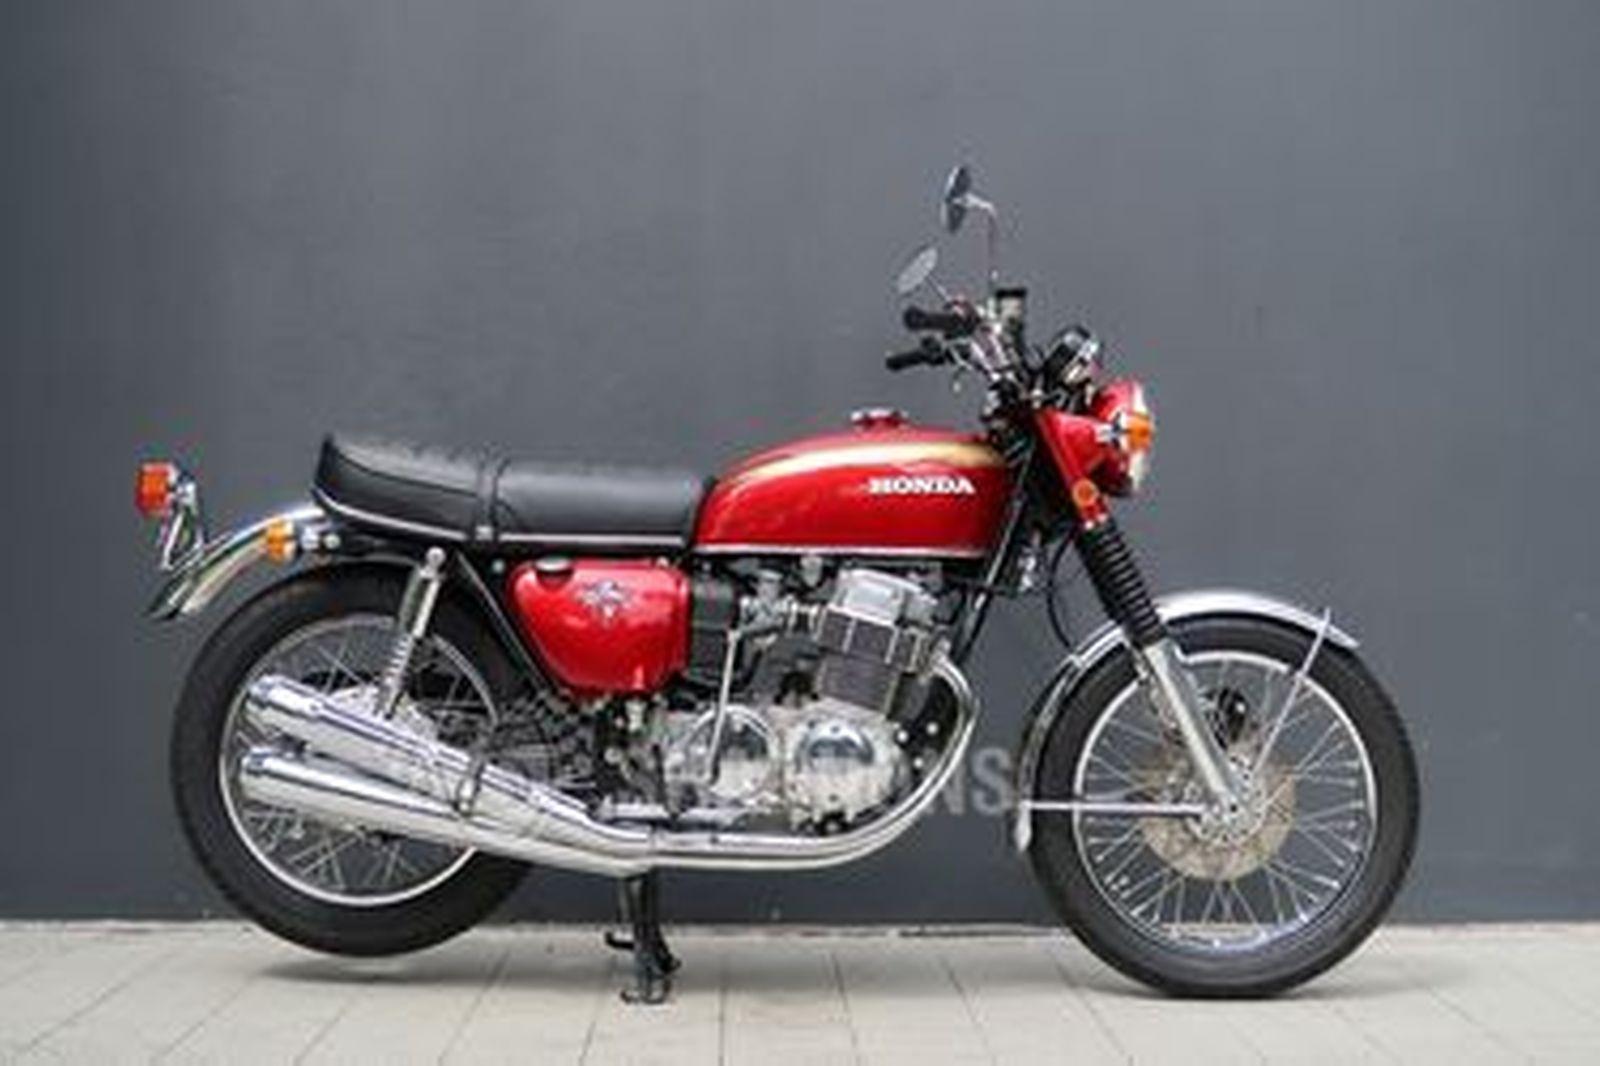 Honda CB750 K1 Motorcycle